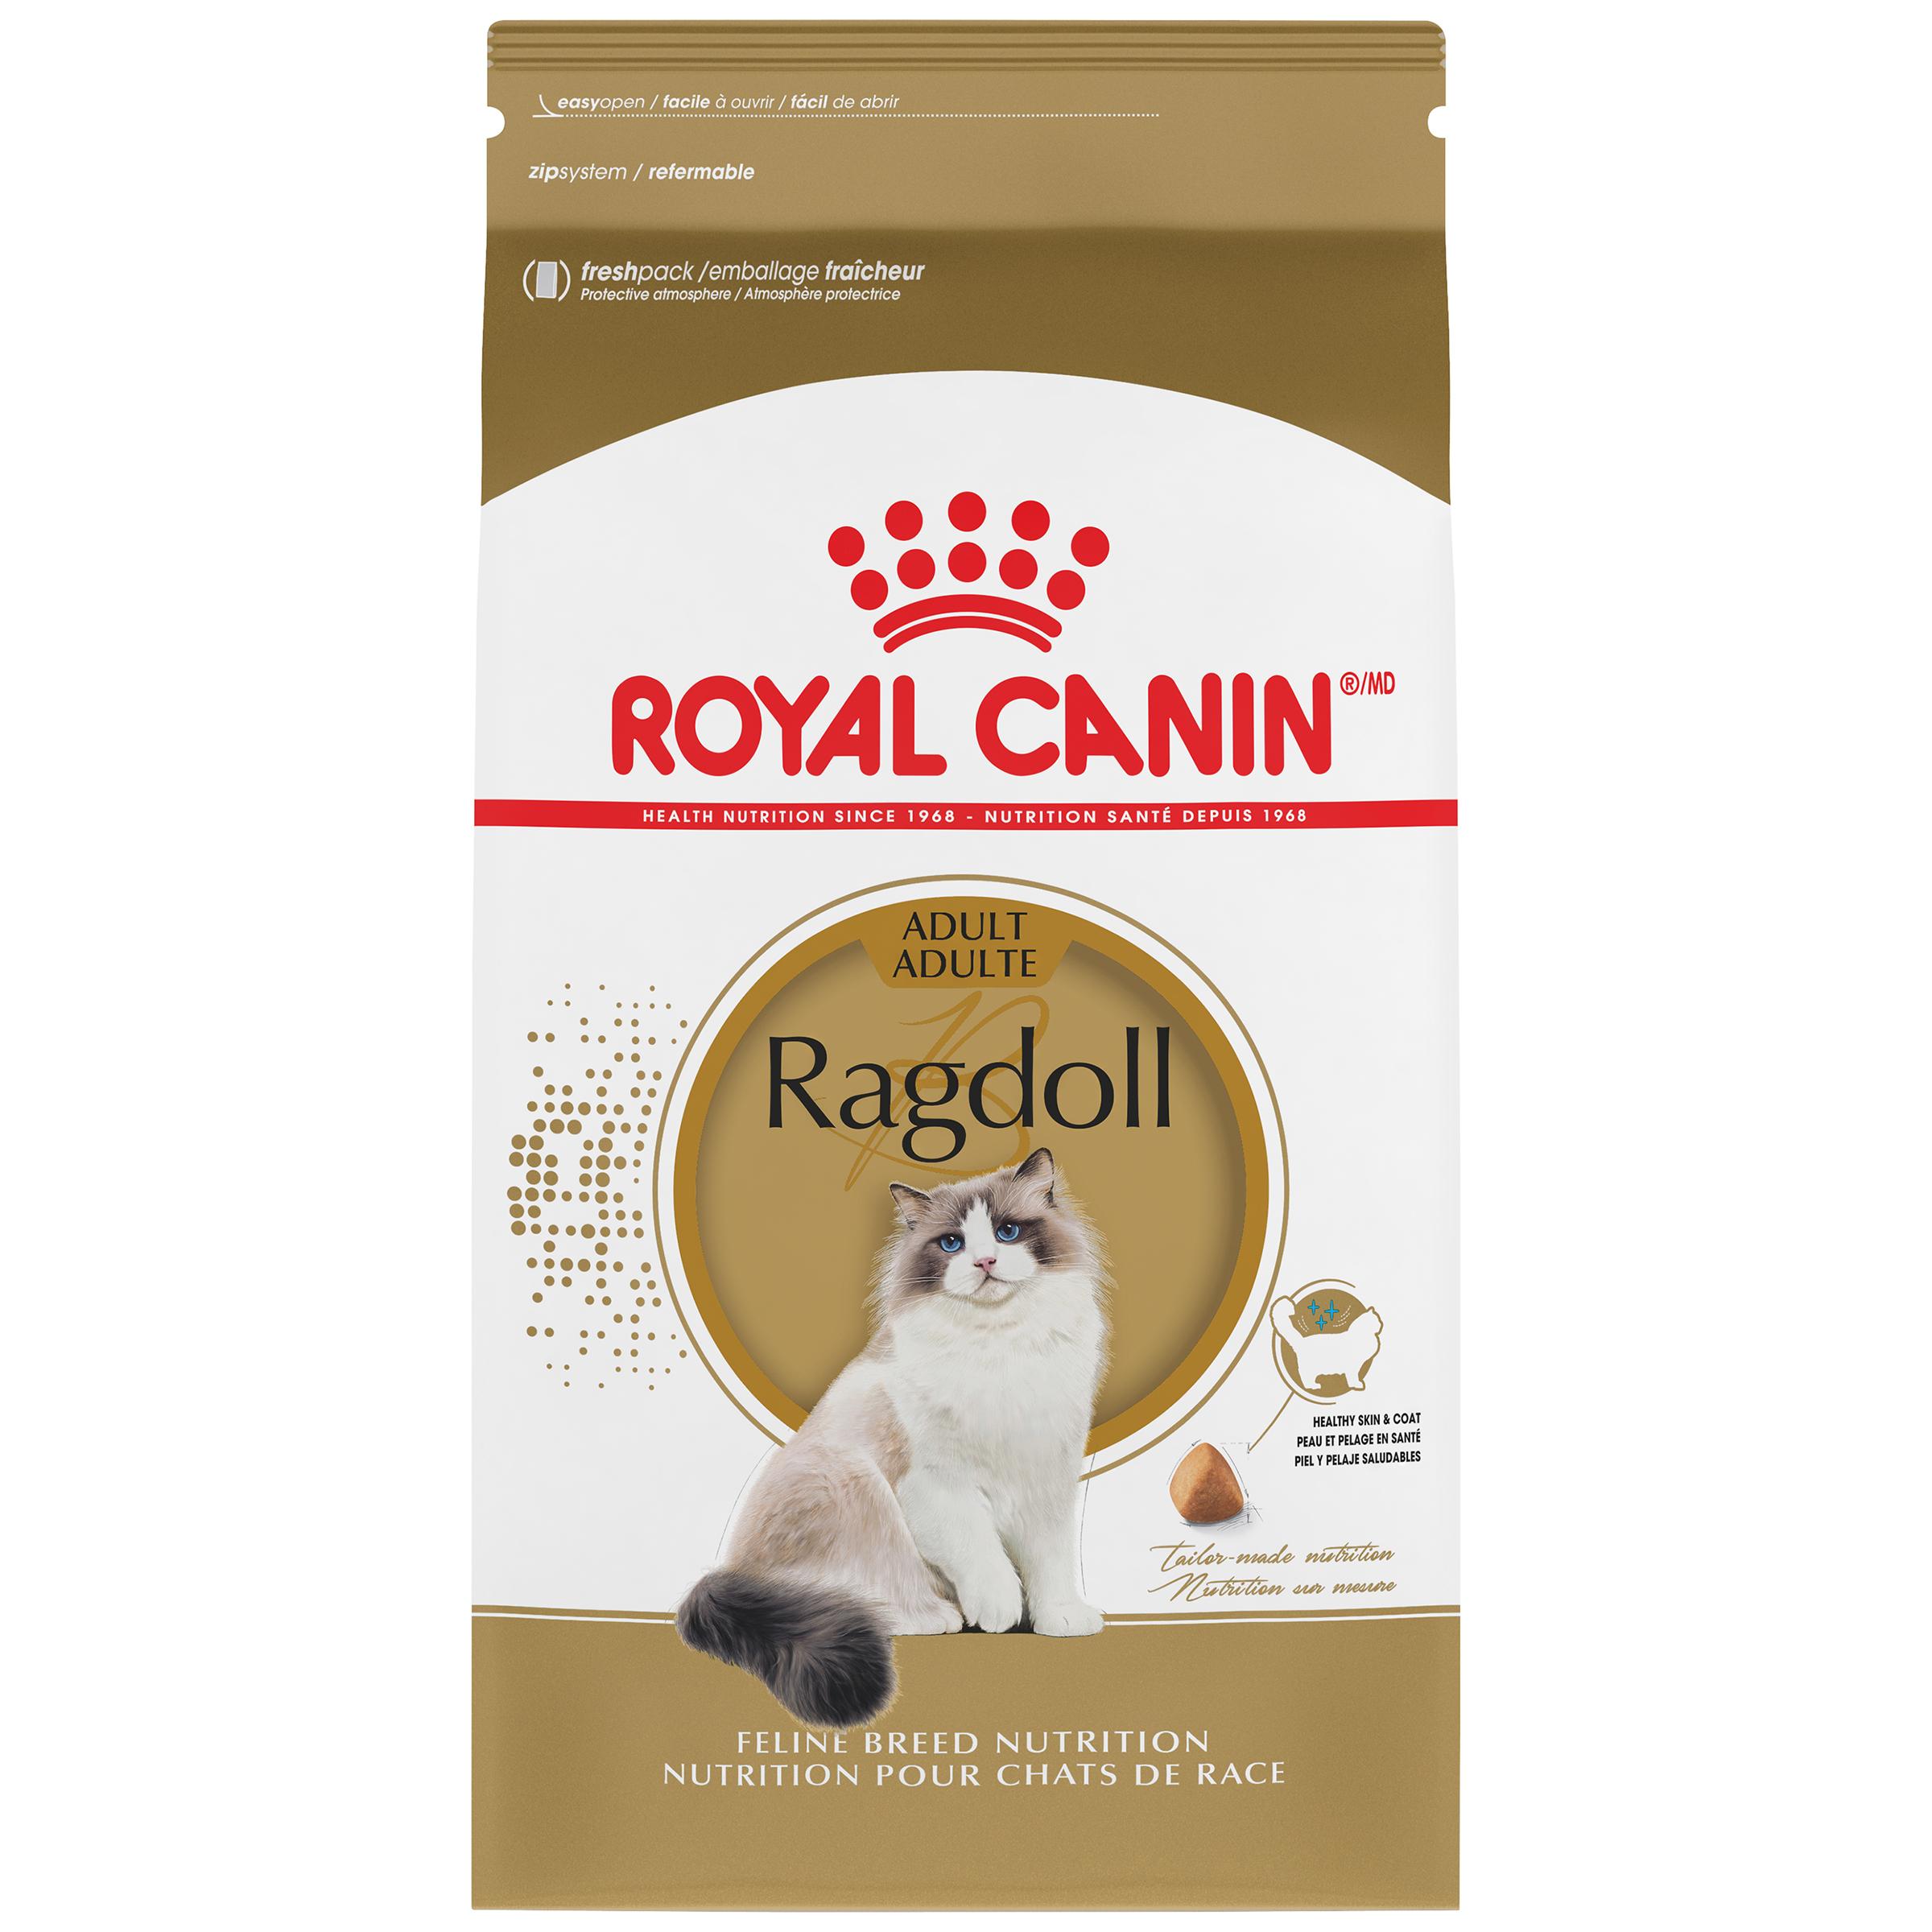 Royal Canin Feline Breed Nutrition Ragdoll Adult Dry Cat Food Image